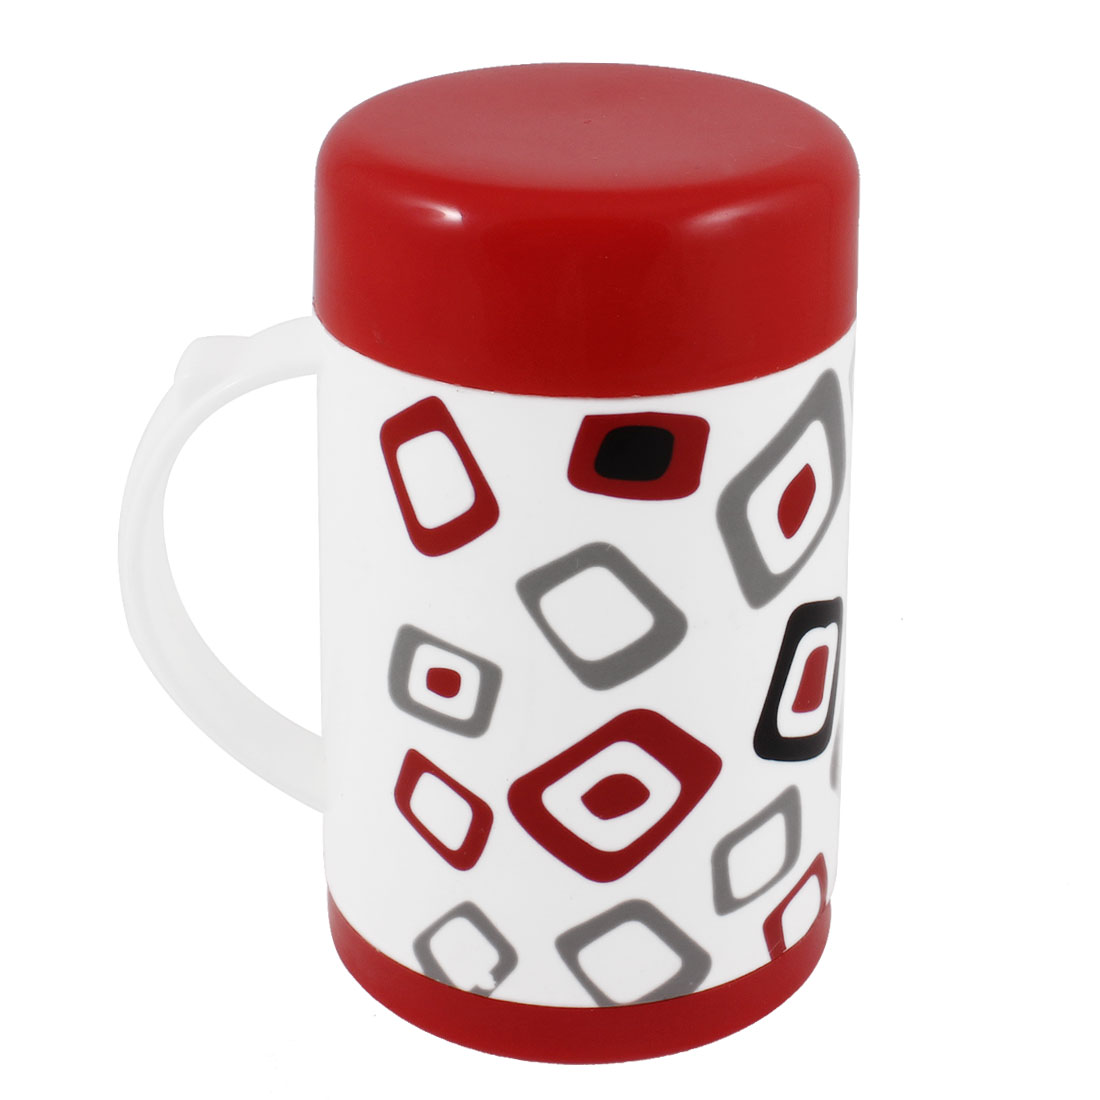 350ml Capacity White Red Plastic Tea Coffee Vacuum Flask Bottle